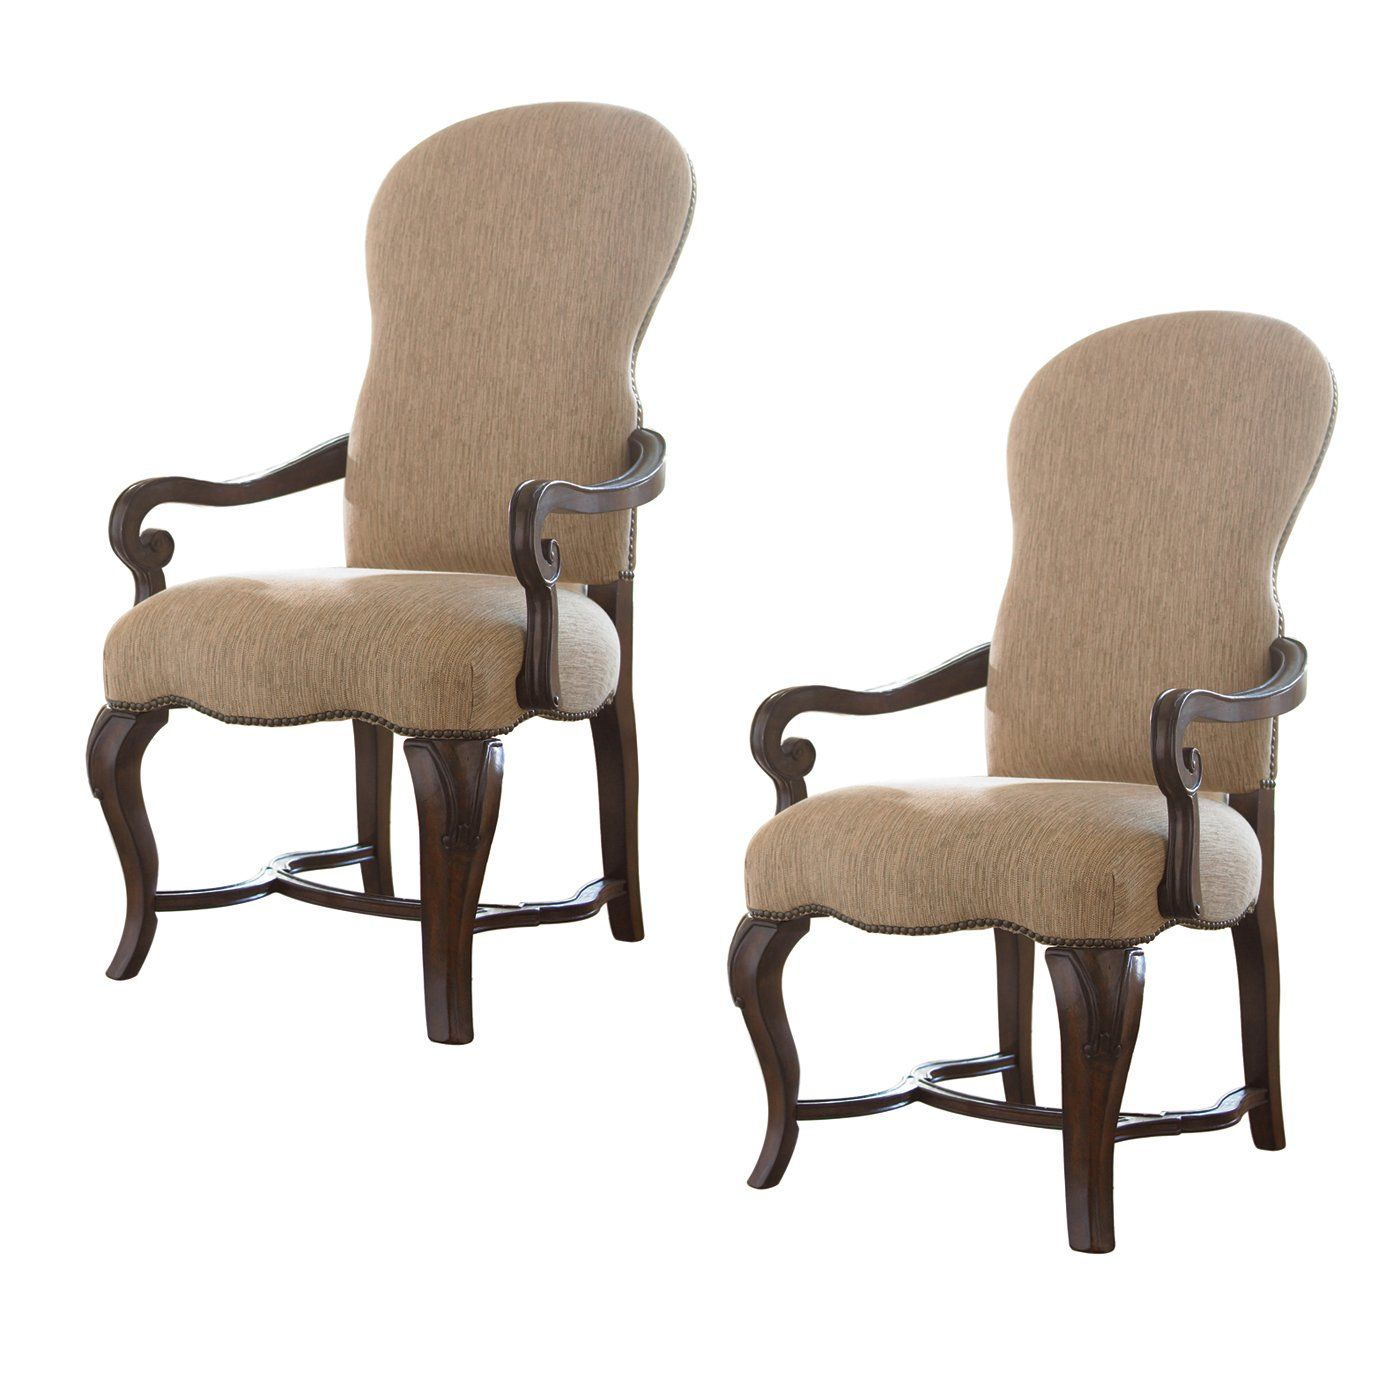 upholstered arm dining chair raynor ergohuman universal furniture 901639 rta contessa olde world cherry set of 2